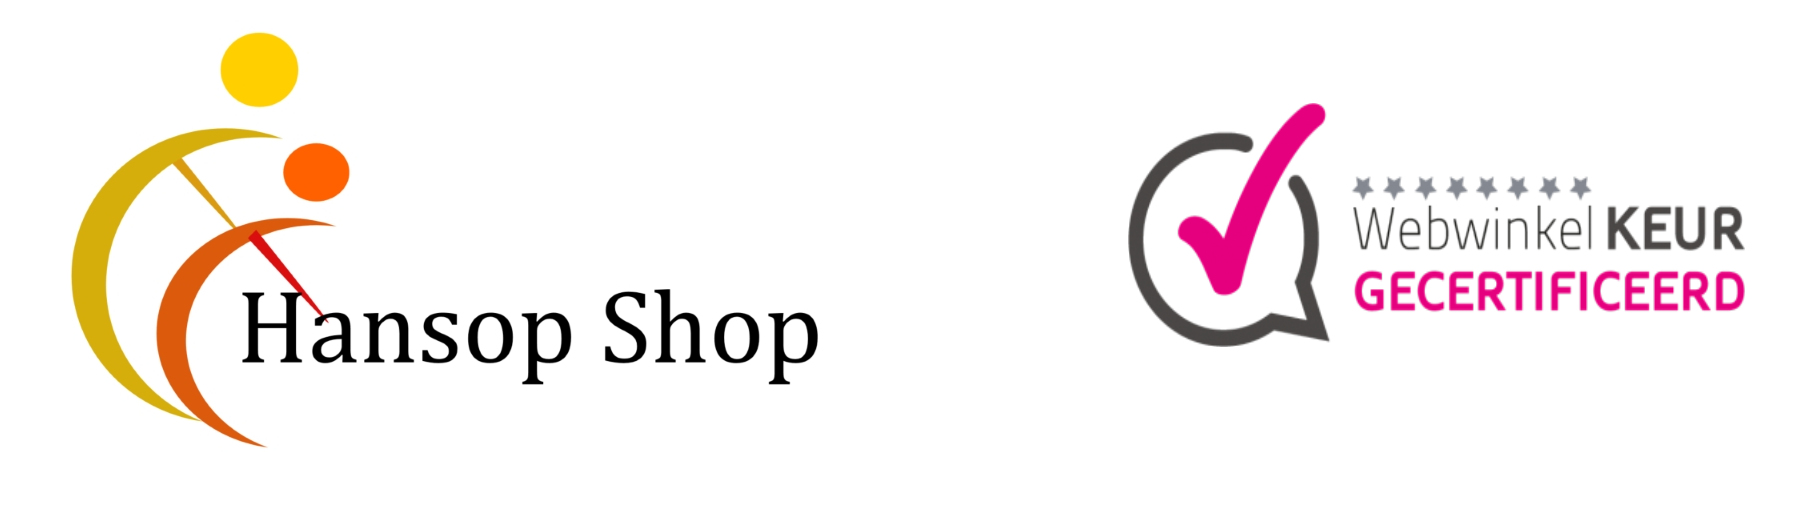 Hansop.shop